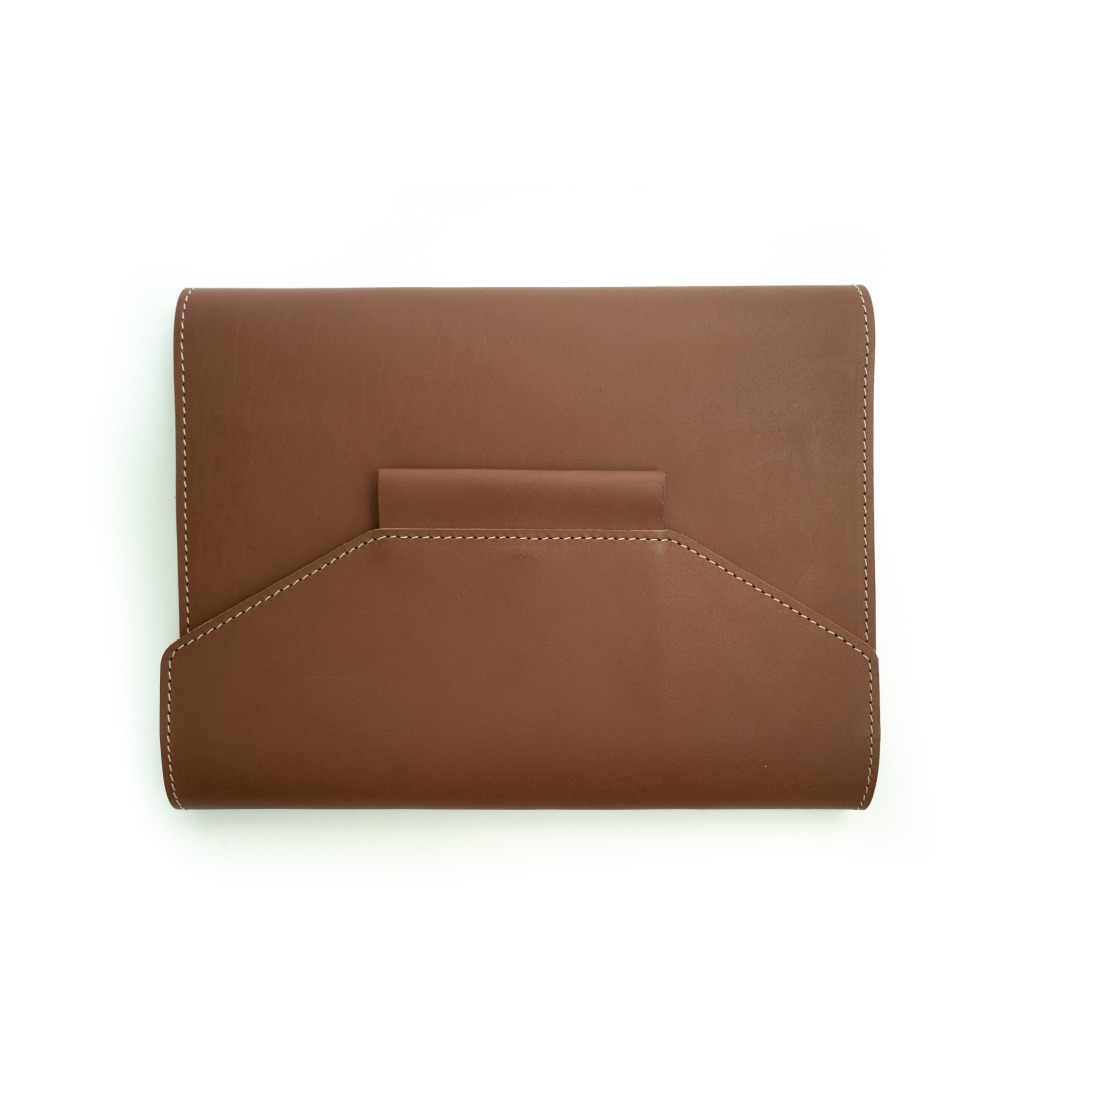 Essential Leather Notebook Organizer